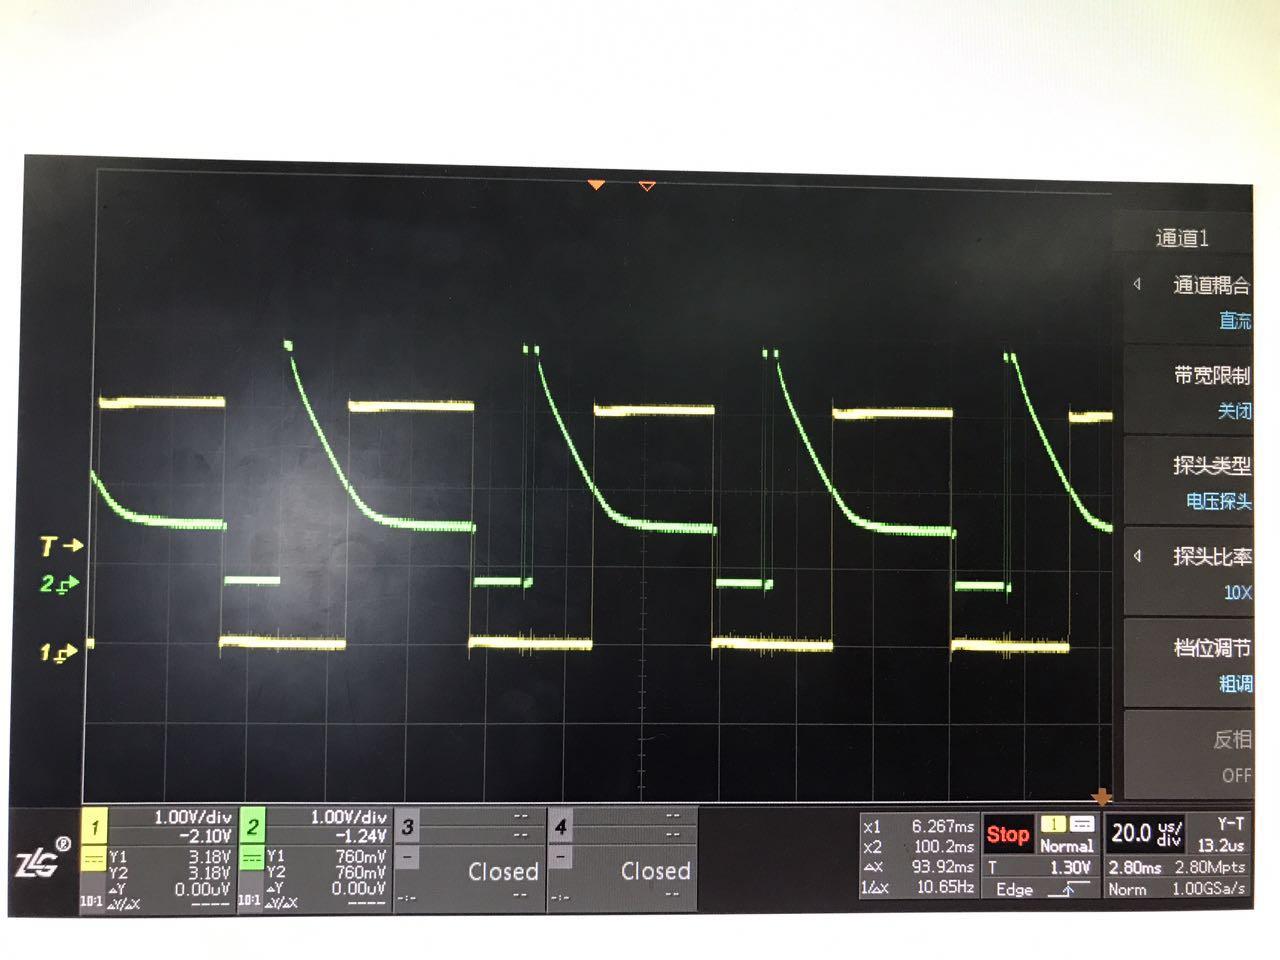 TLV320AIC23B: TLV320AIC23B Din waveform is wired - Audio Converters ...